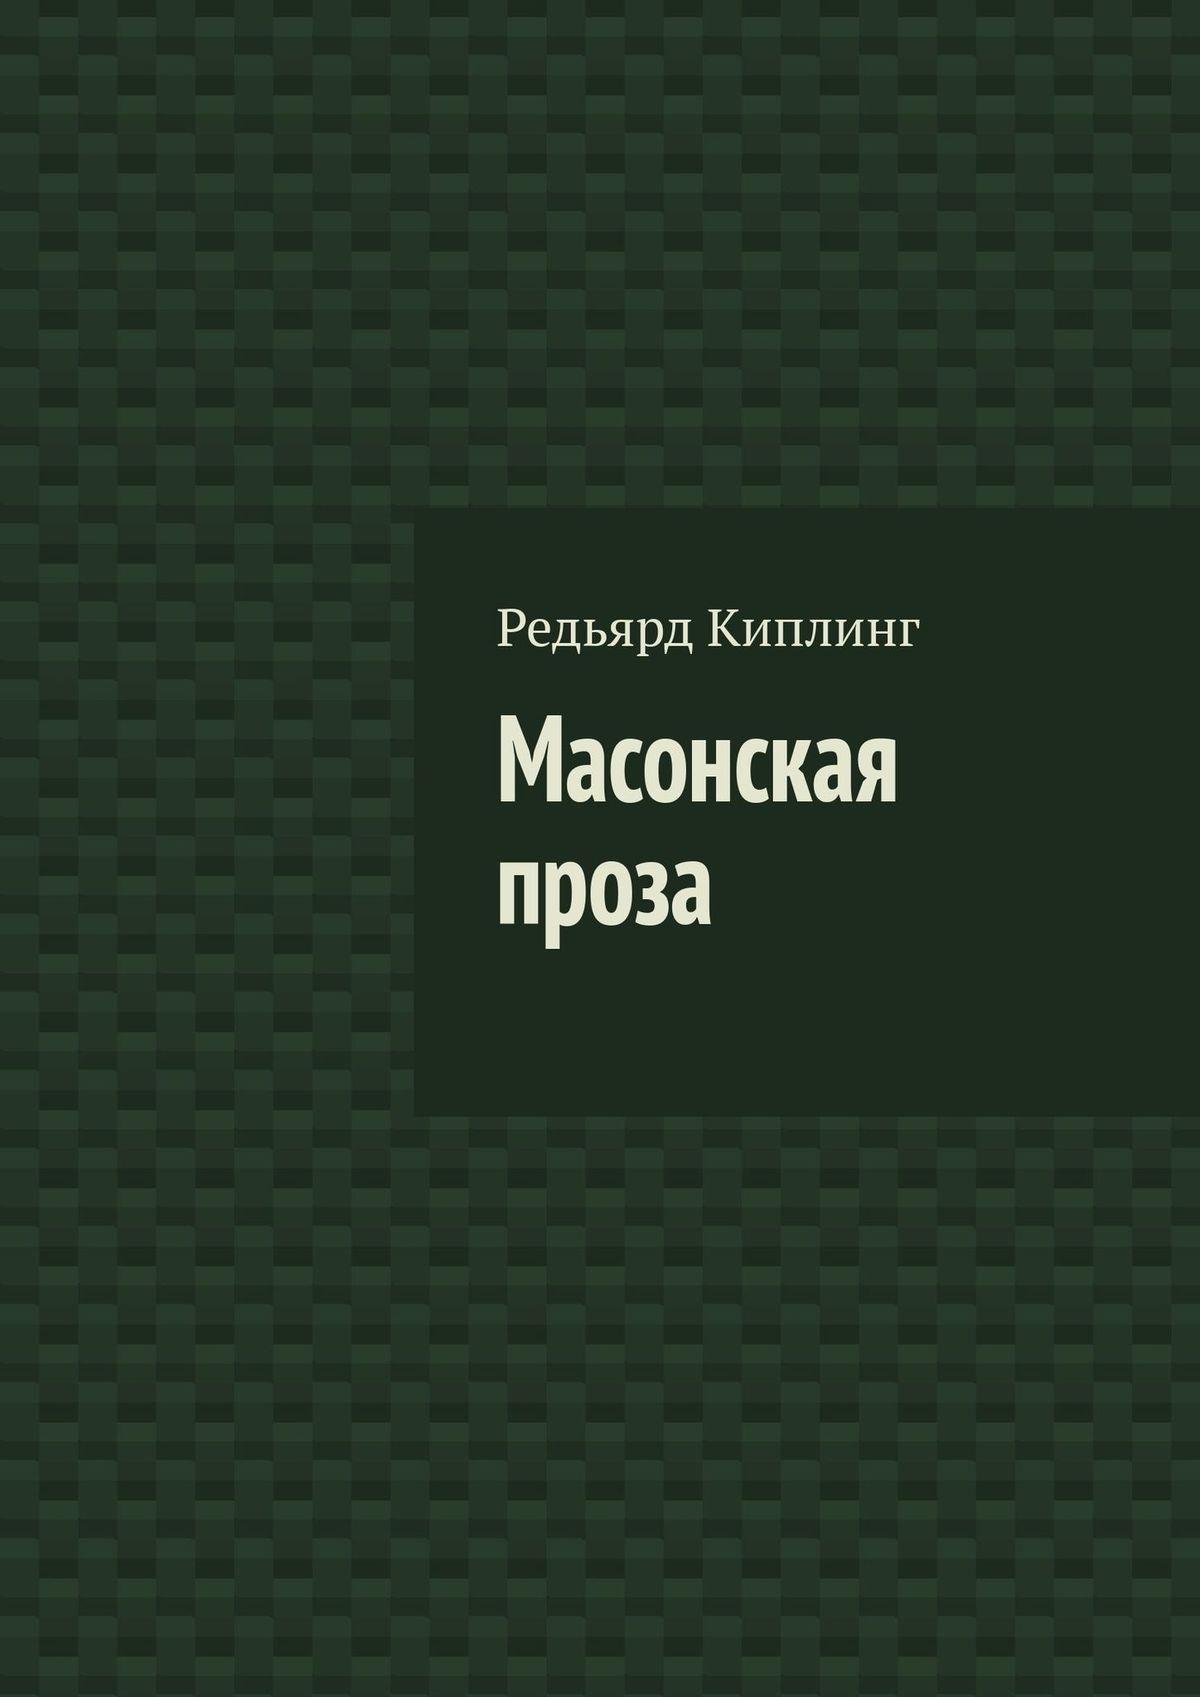 Редьярд Киплинг, Е. Кузьмишин «Масонская проза»